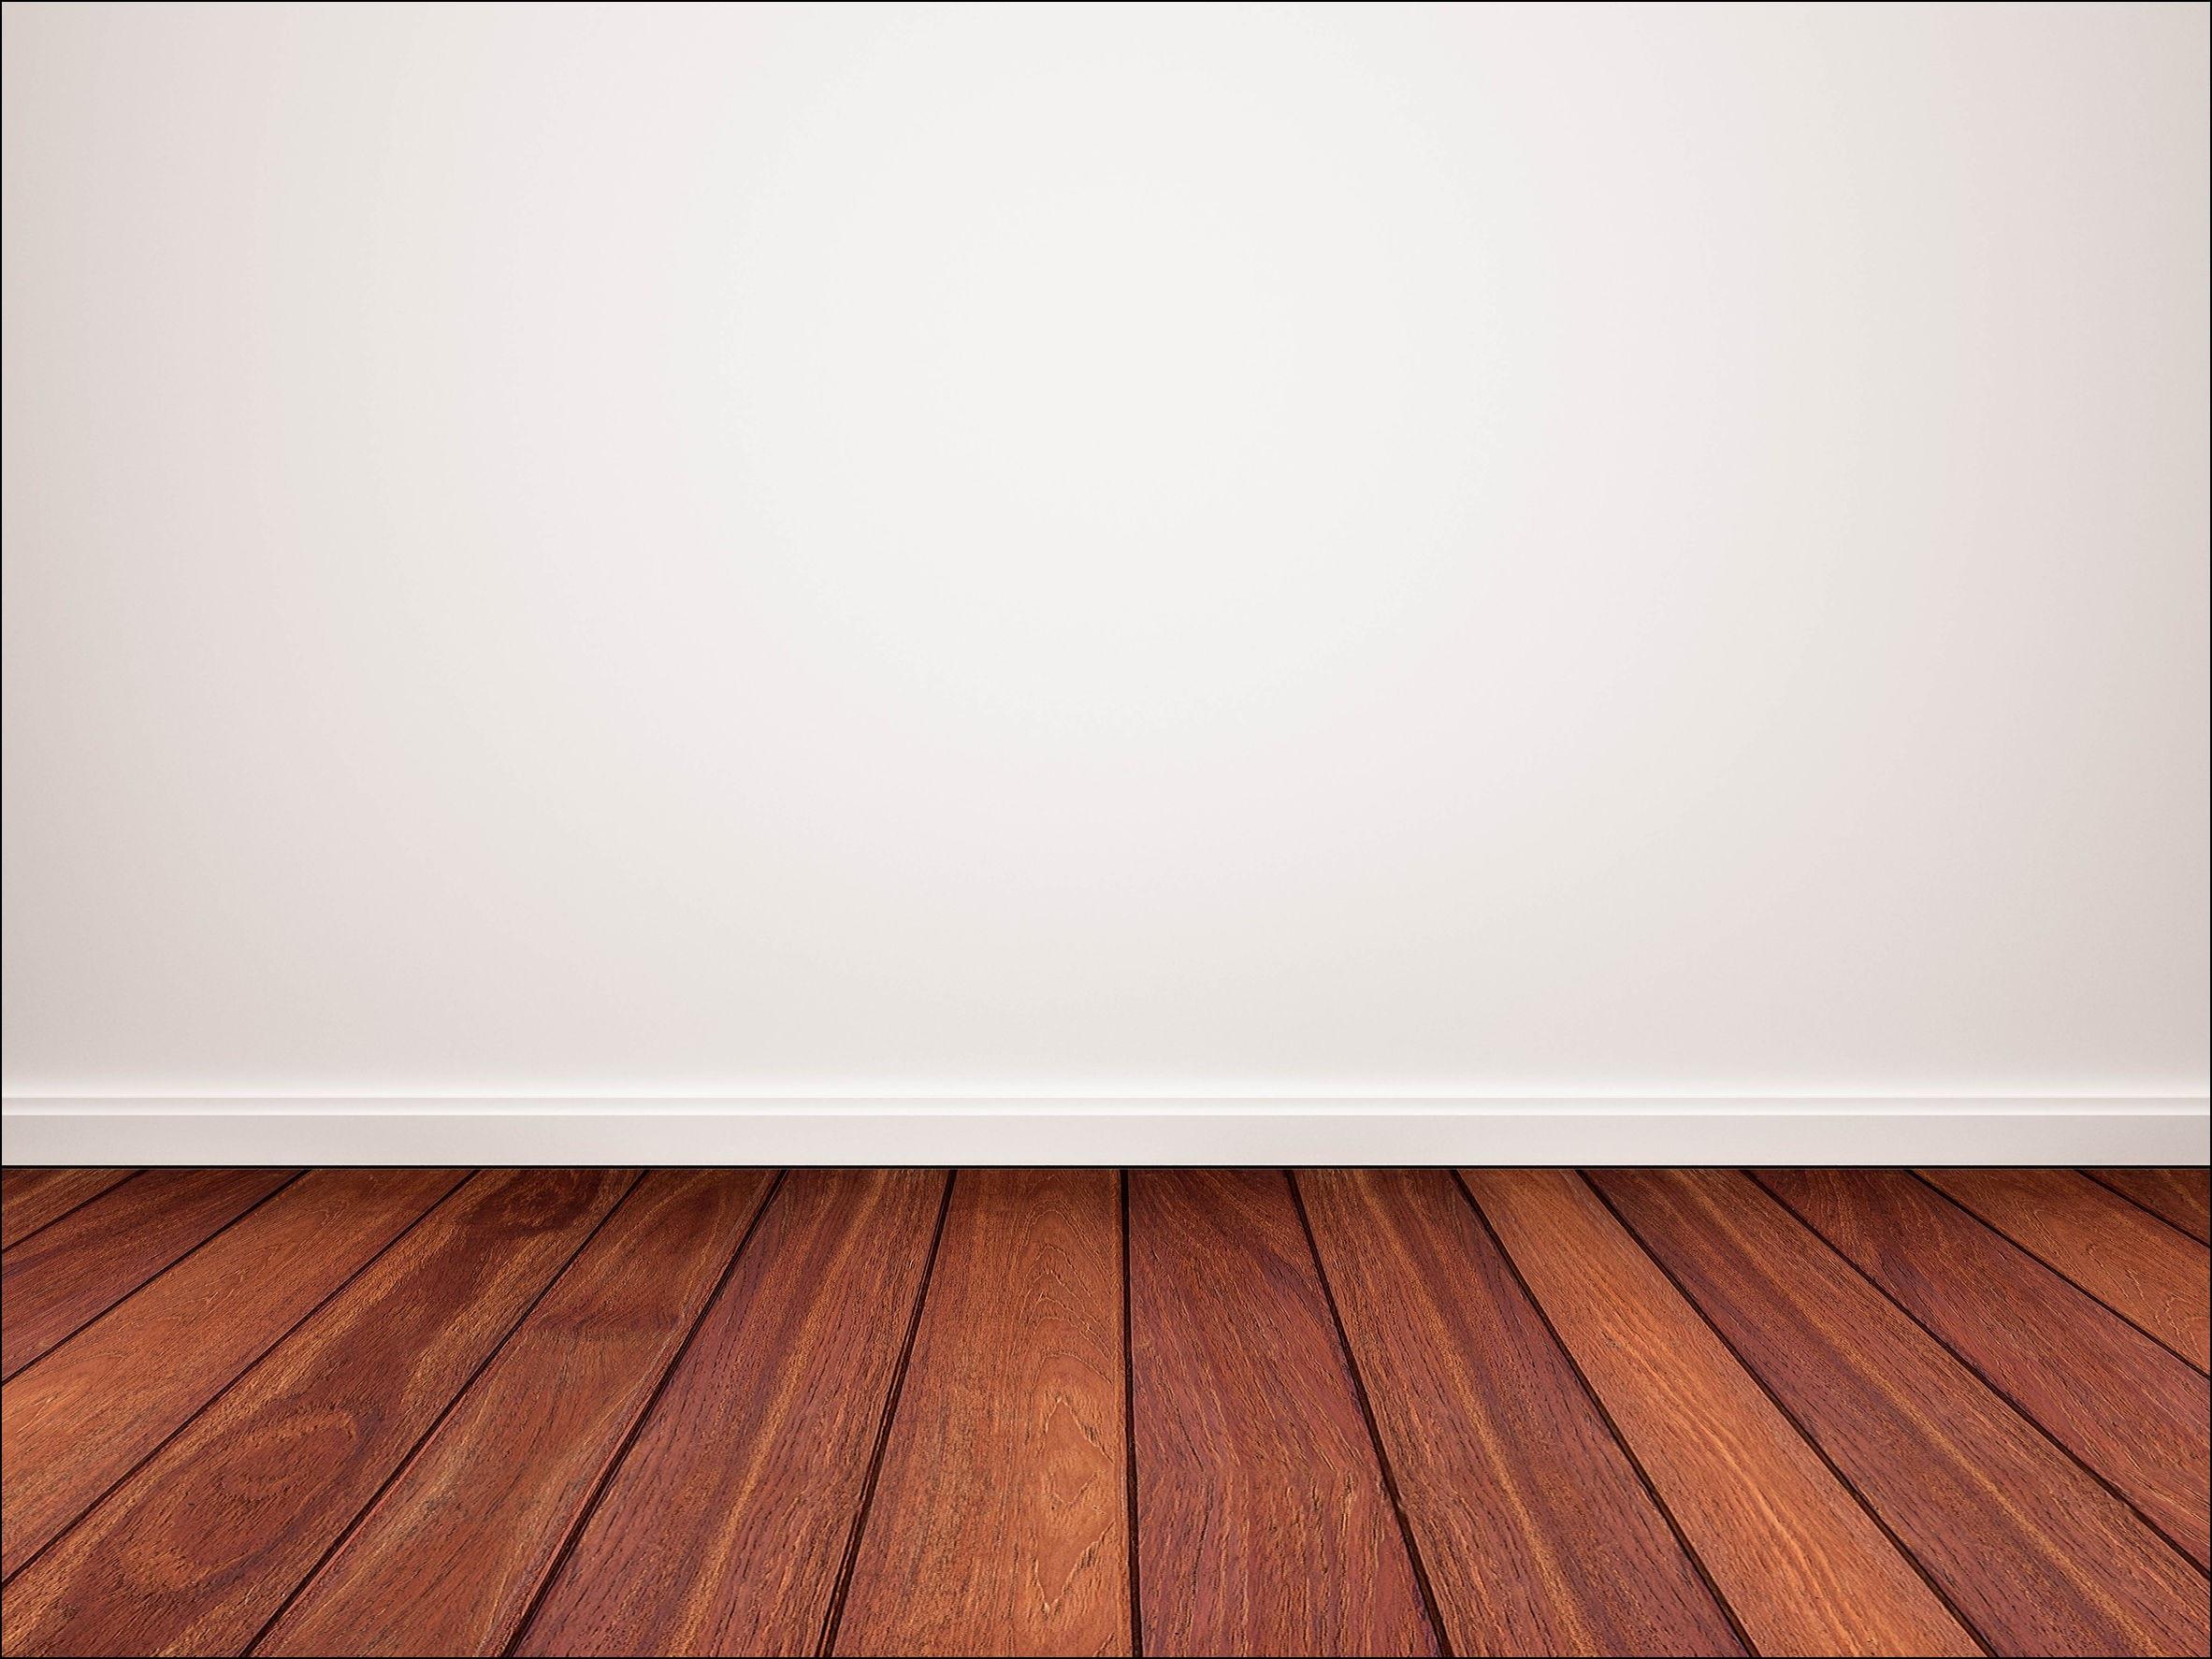 bella hardwood flooring prices of brazilian cherry hardwood flooring for sale 3 4 x 5 brazilian intended for brazilian cherry hardwood flooring for sale images brazilian cherry hardwood floor beautiful cherry floors home design